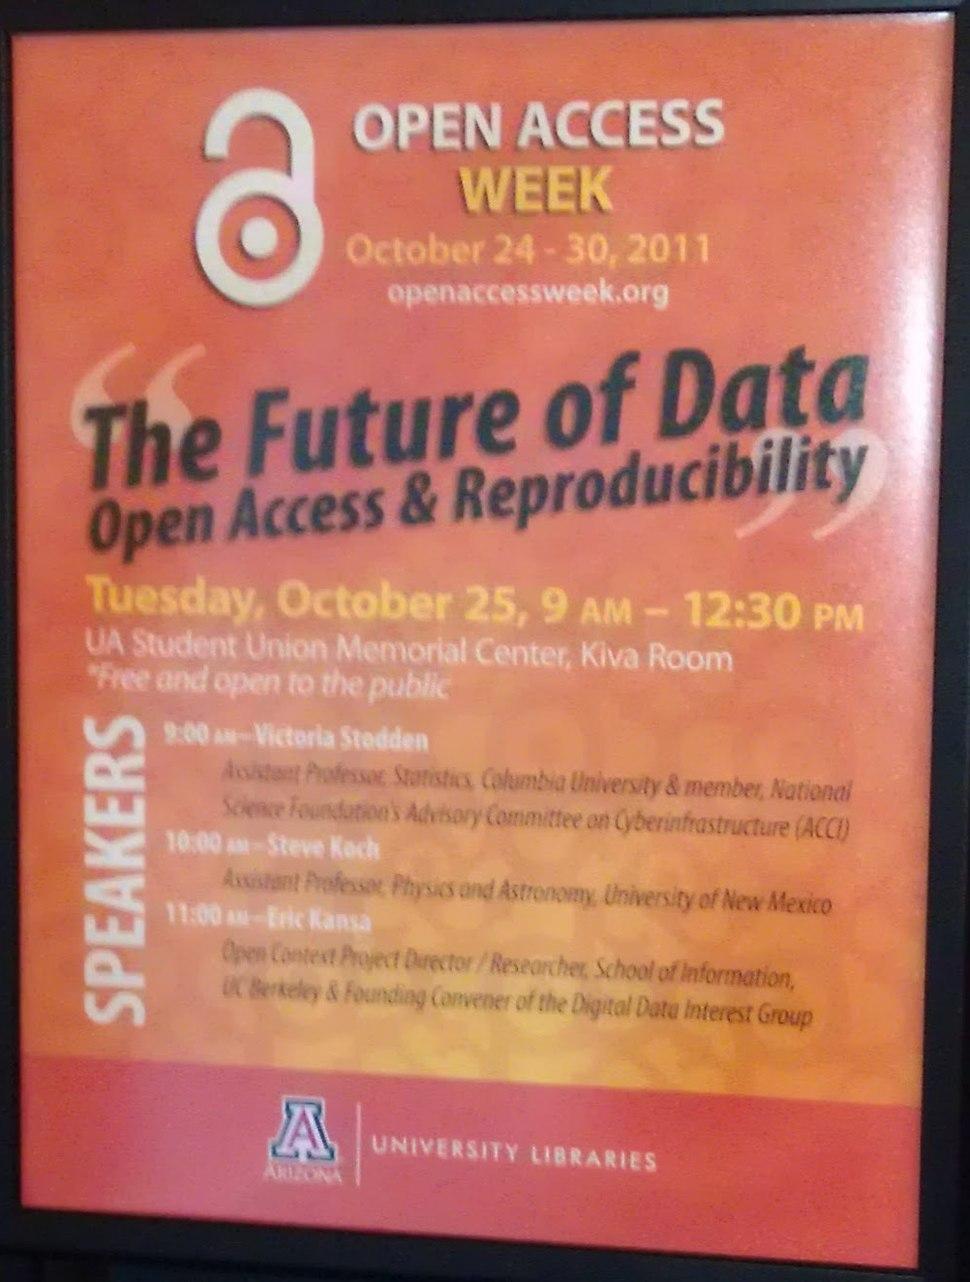 U Arizona Open Access Week October 25, 2011